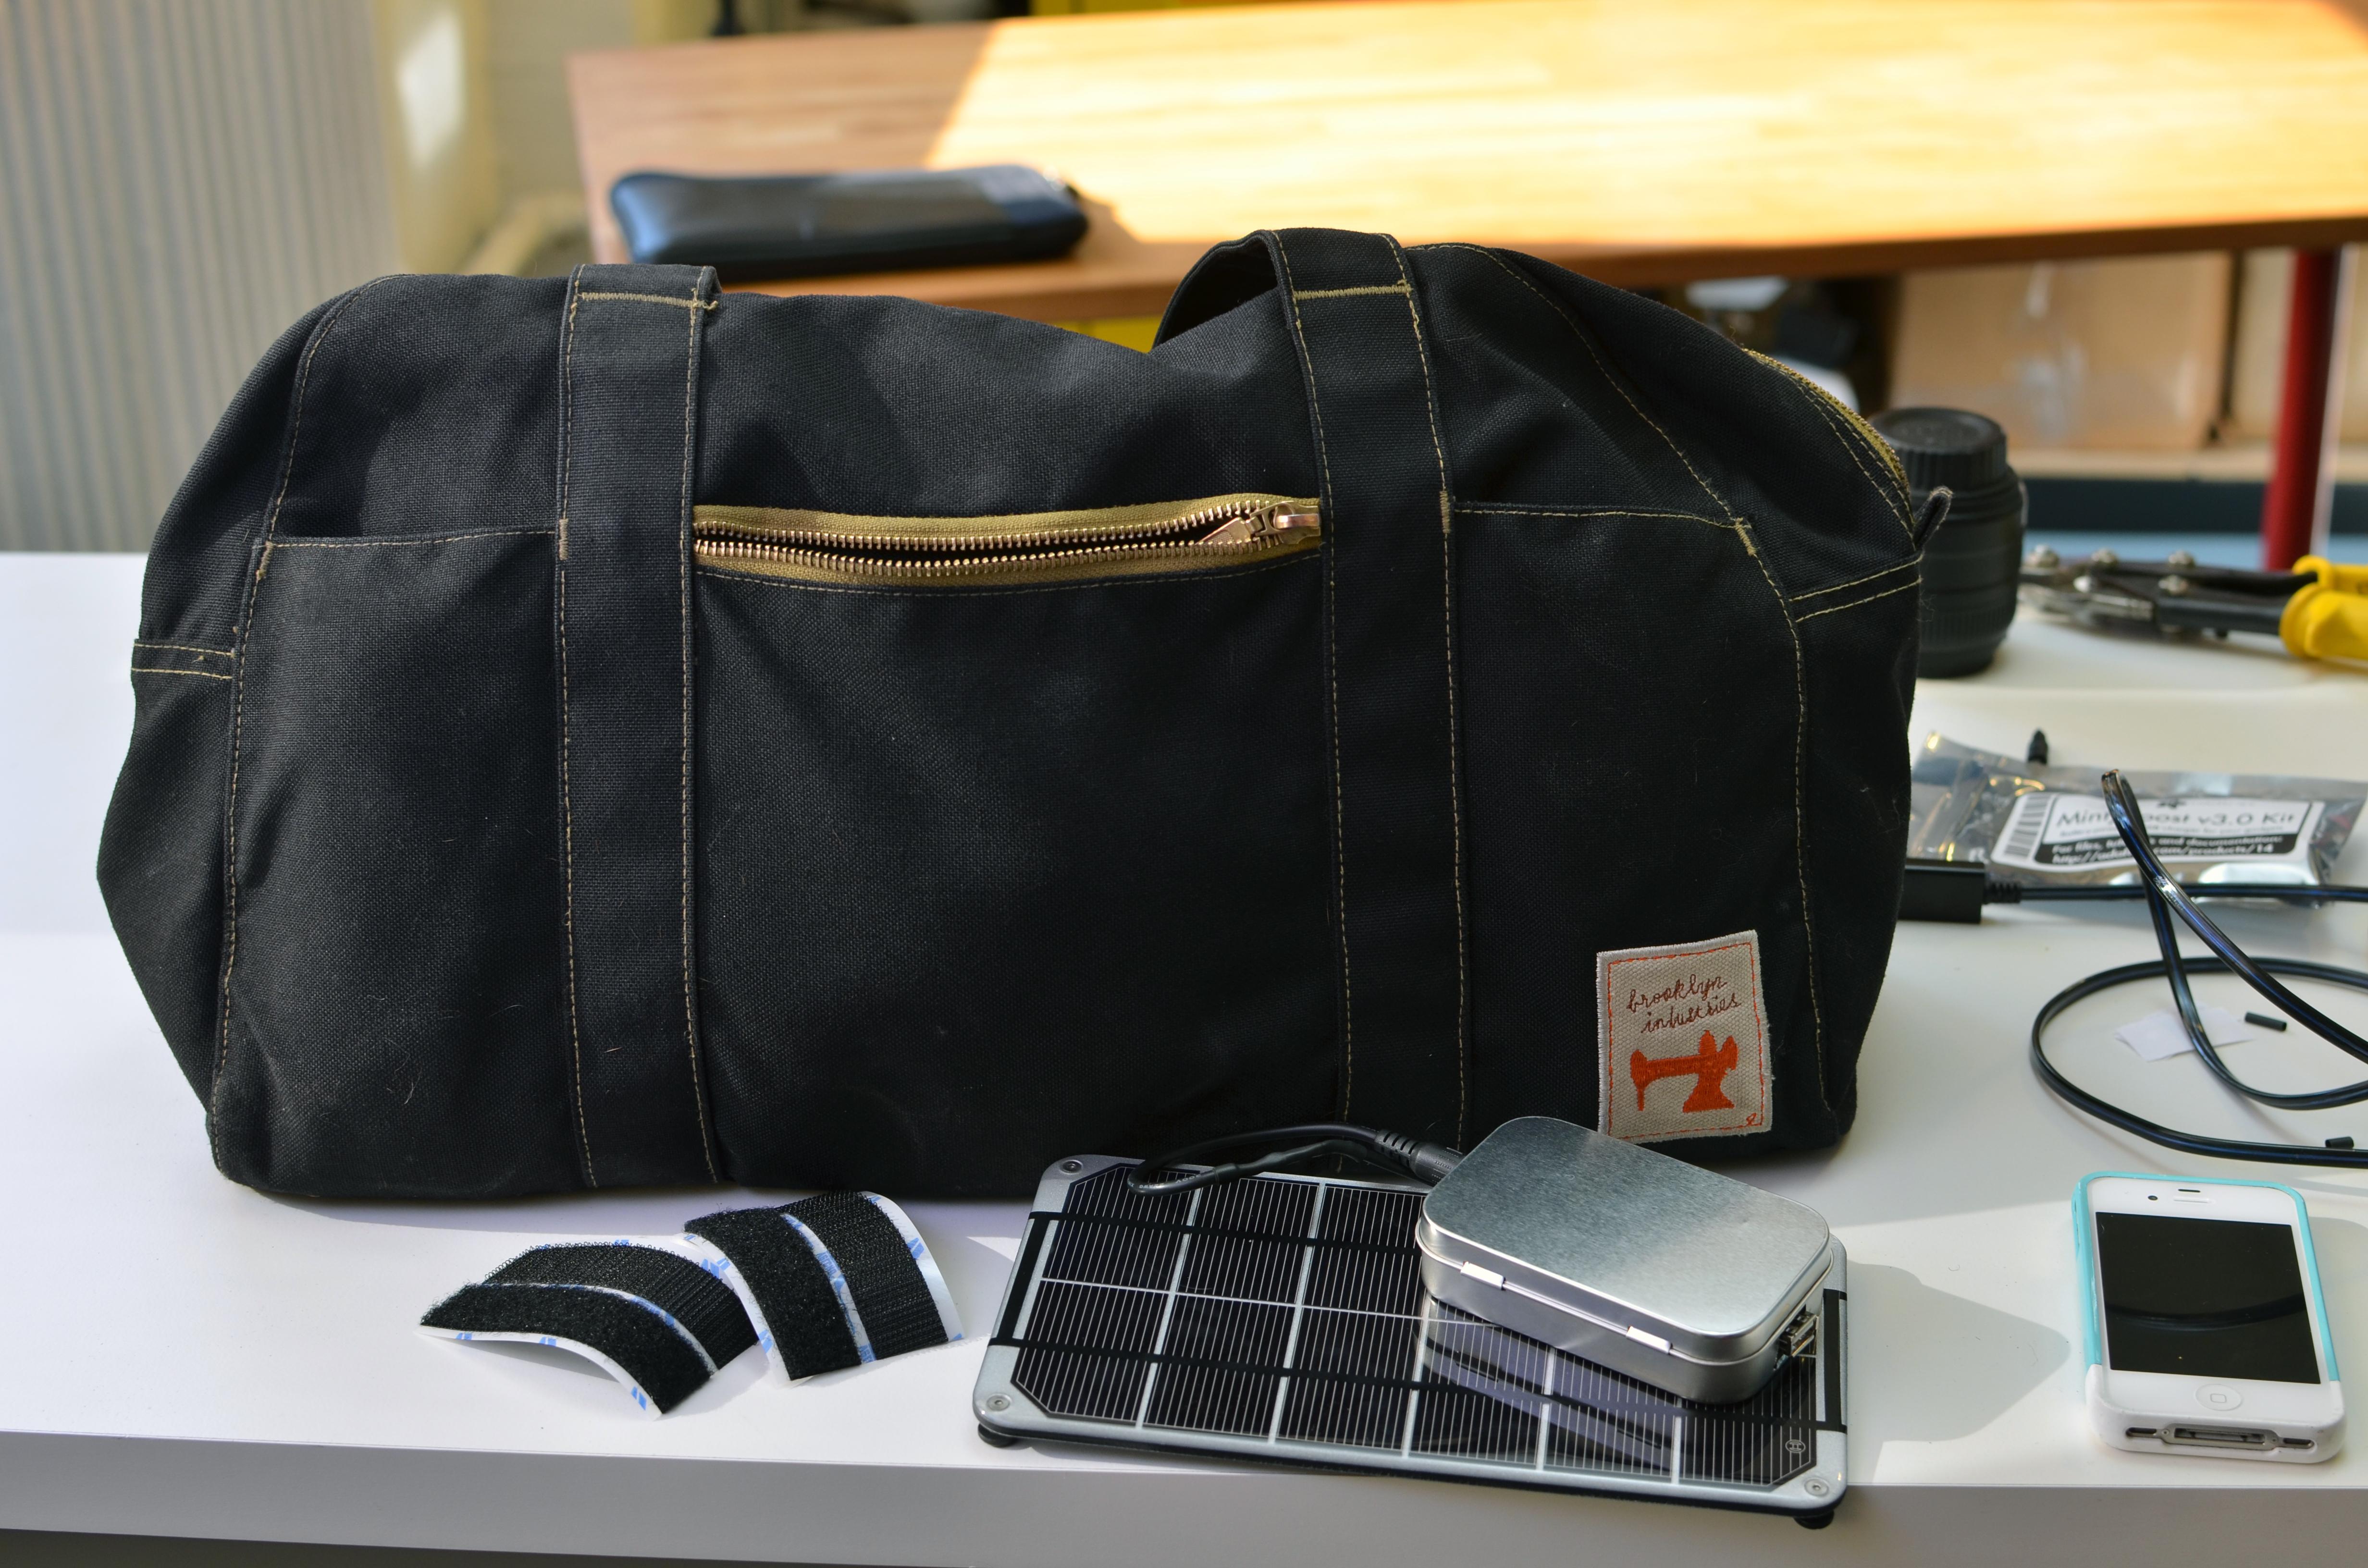 projects_solar-bag-minty-boost-adafruit-14.jpg